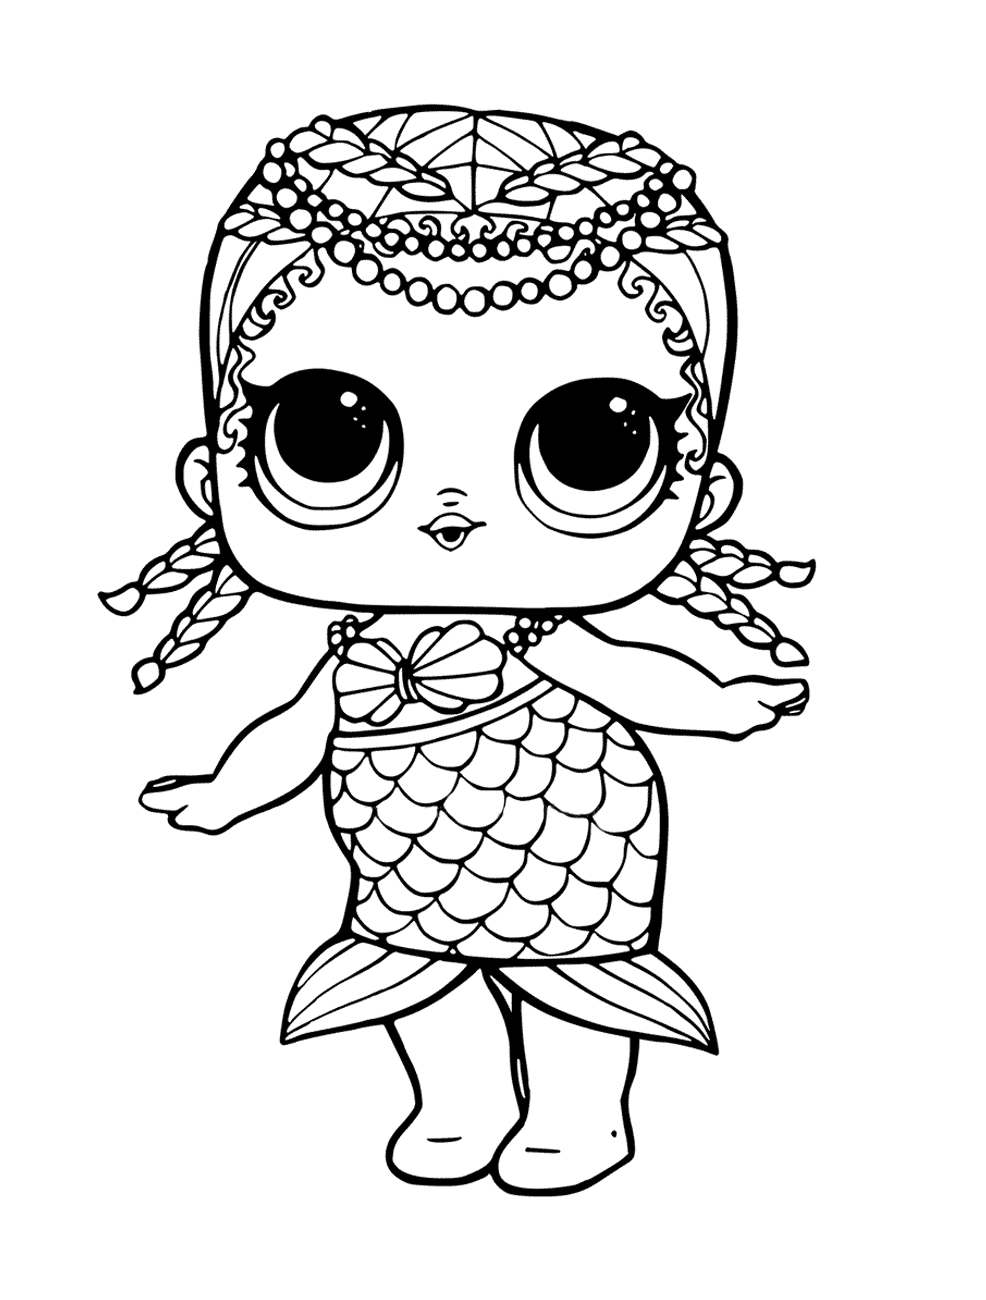 Кукла ЛОЛ русалка - Куклы LOL - Раскраски антистресс